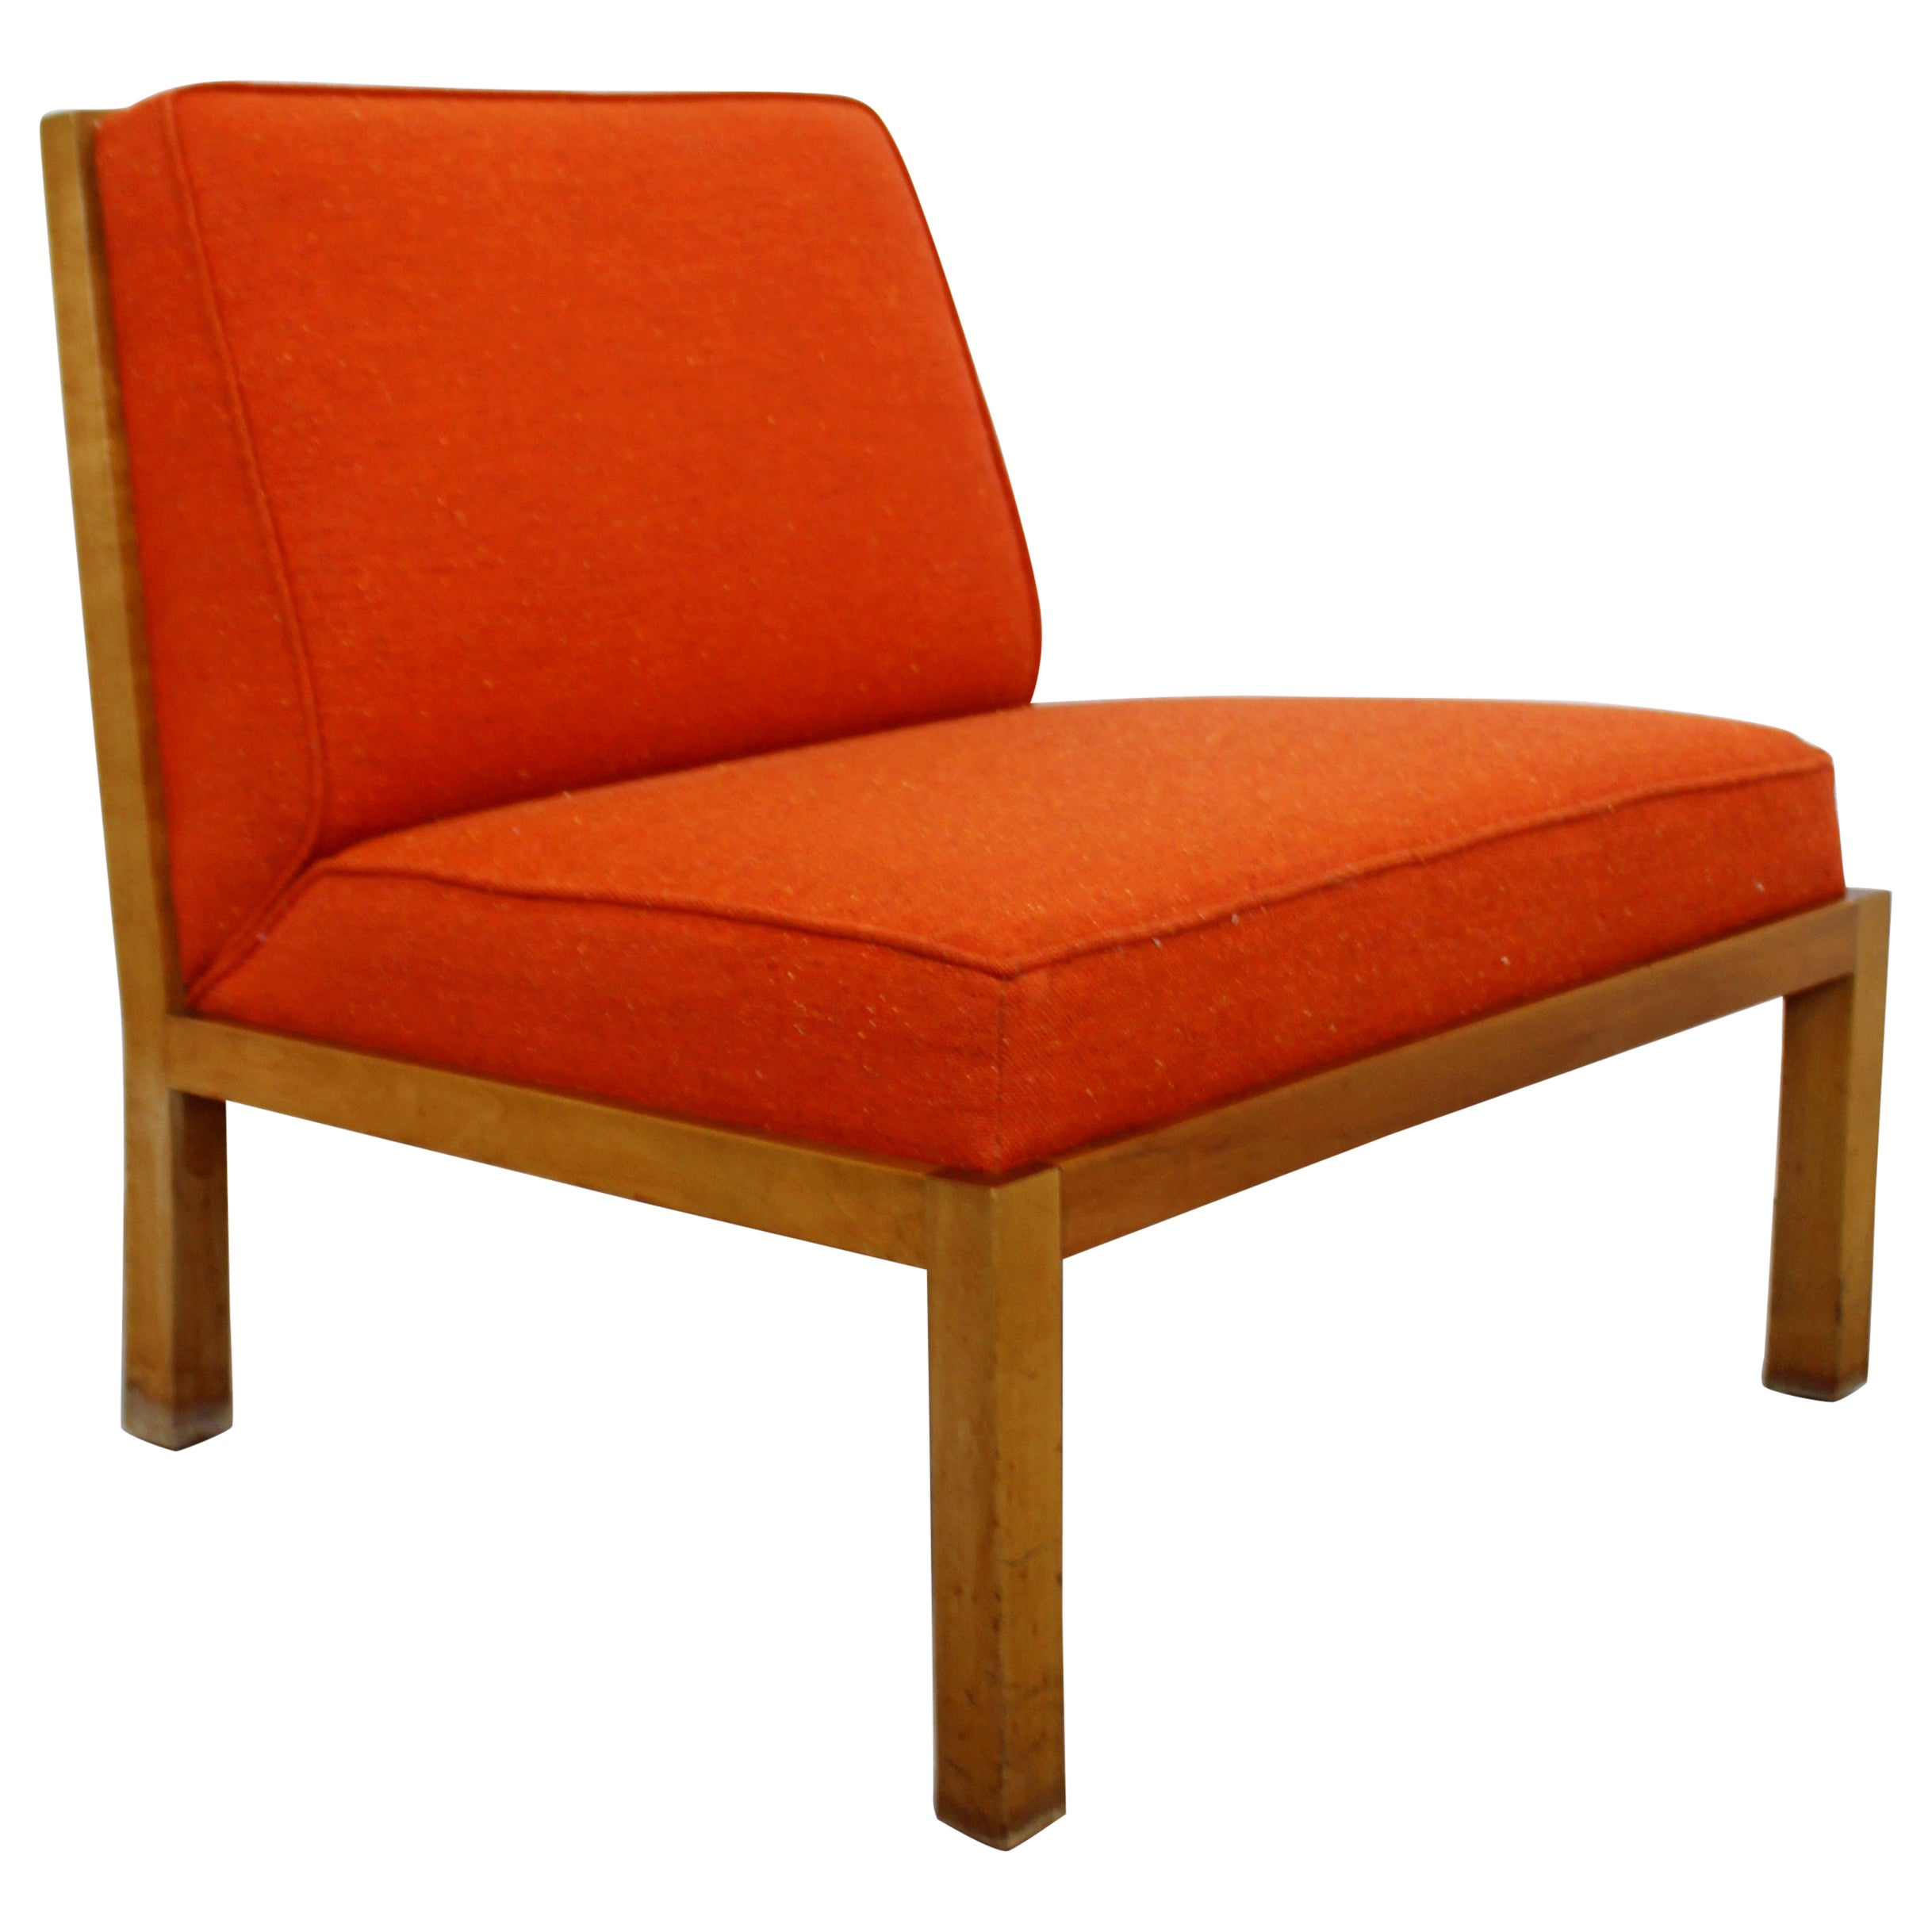 Mid-Century Modern Baker Wood Slat Back Side Lounge Accent Chair 1960s Orange